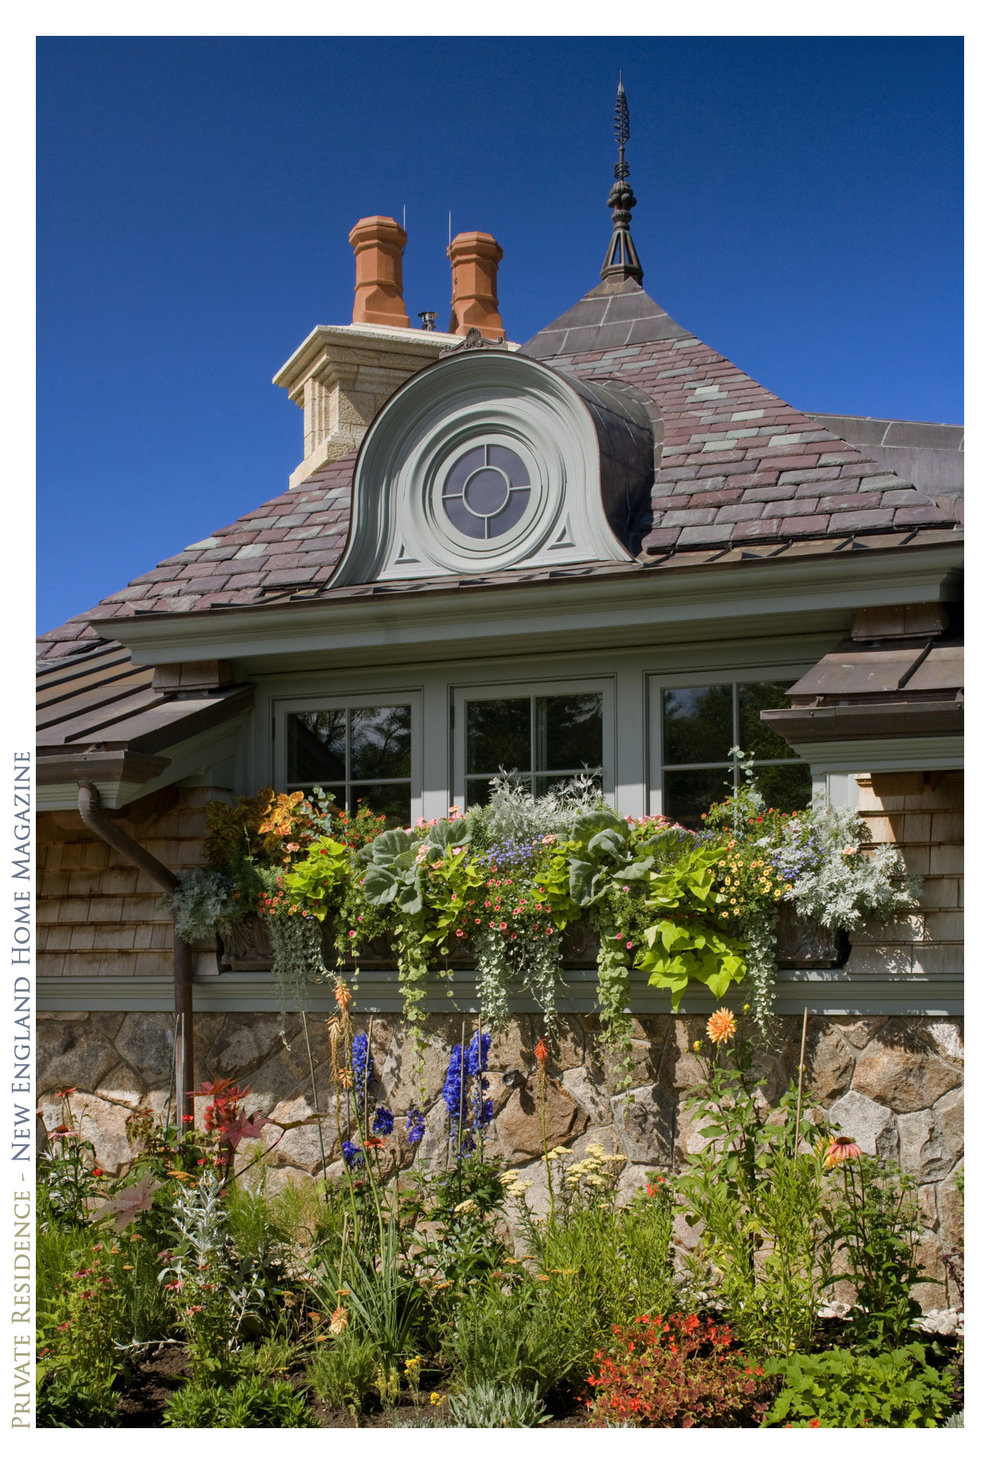 037_Robert-Benson-Photography-Residential-New-England-Home-Magazine-Garden-19.JPG